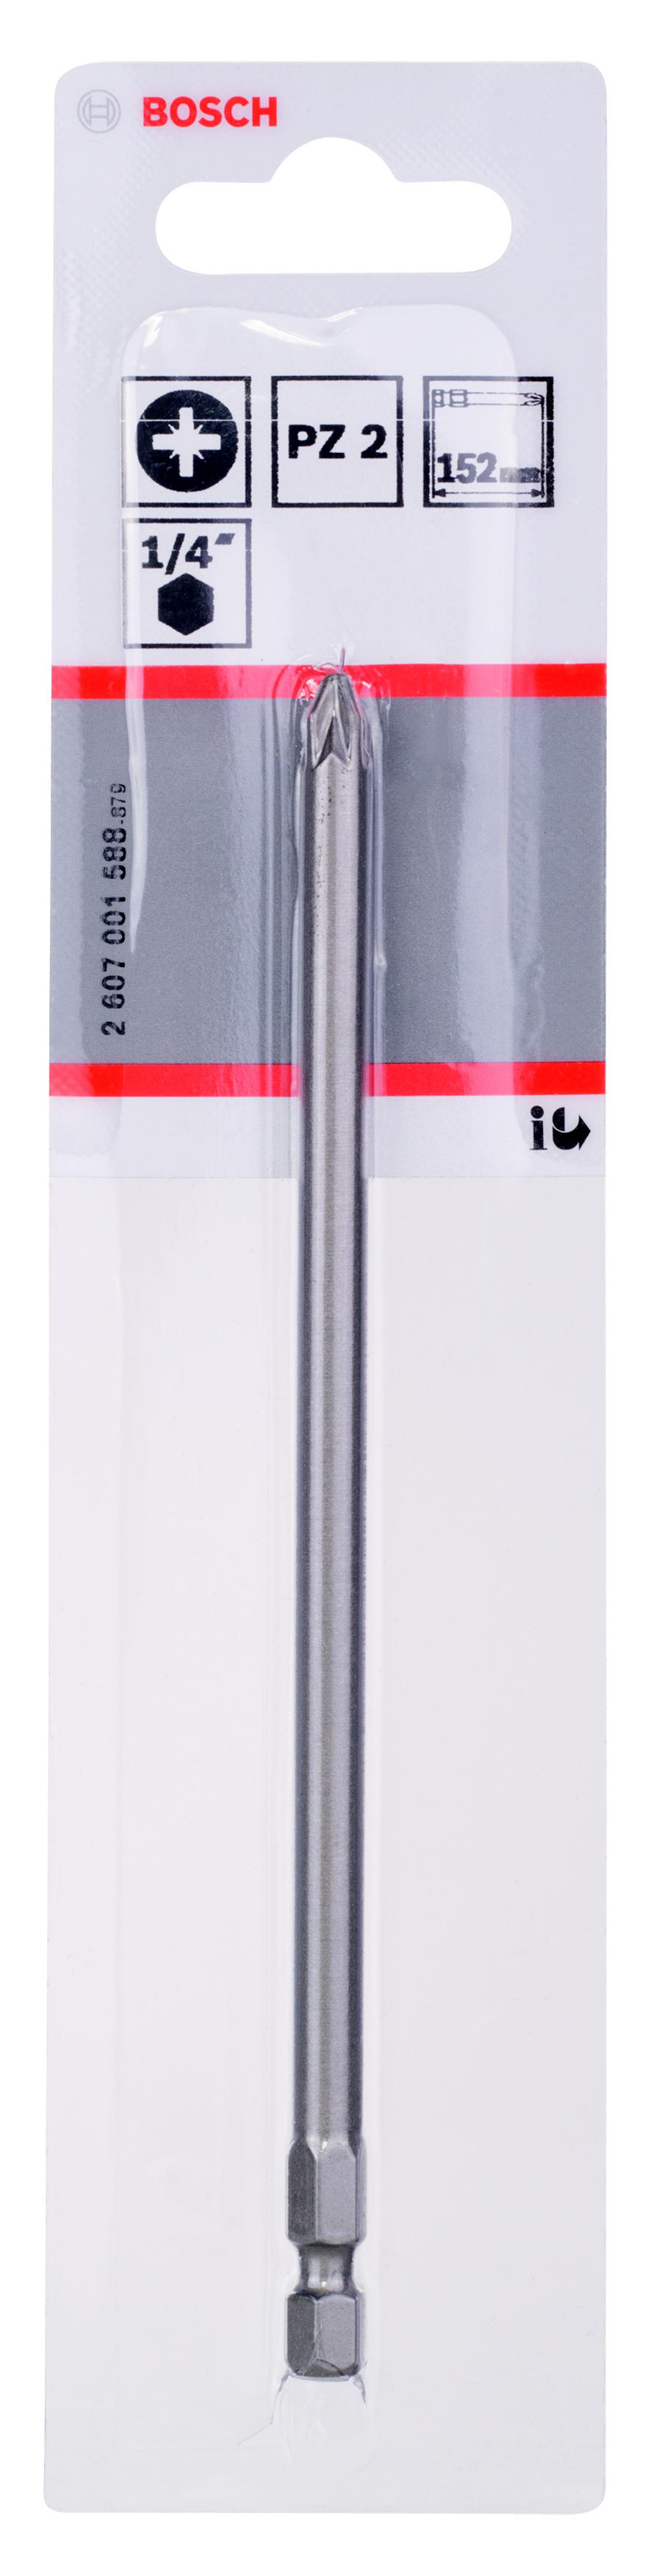 Бита Bosch Extra-hart pz2 152 мм, 1 шт. (2.607.001.588) цена